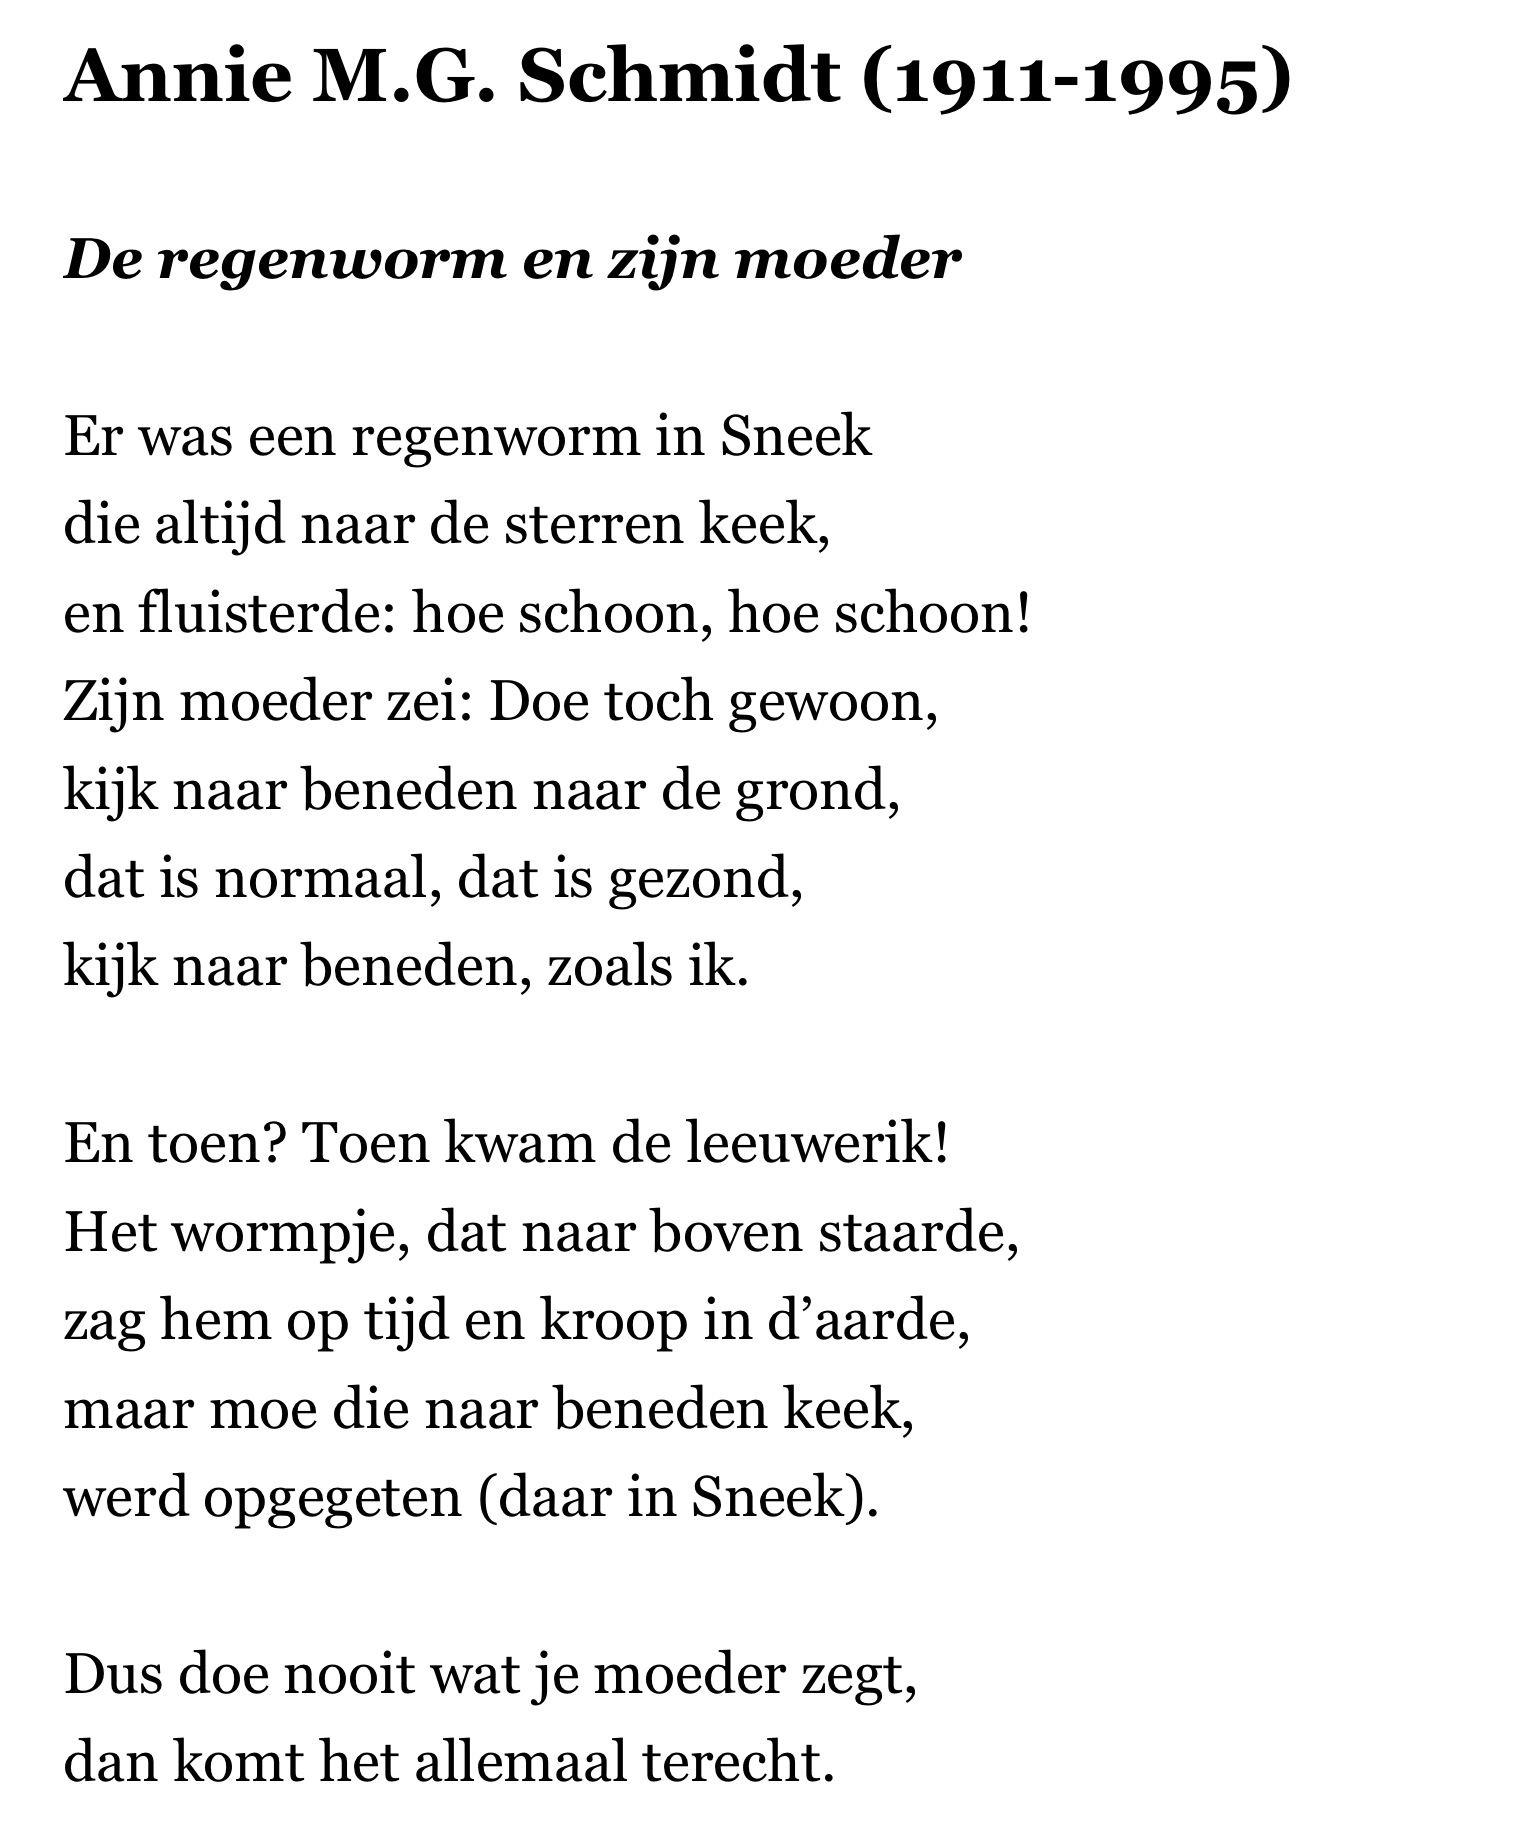 Fabulous Gedicht Annie M G. Schmidt De regenworm | poëzie - Kids poems #PJ42